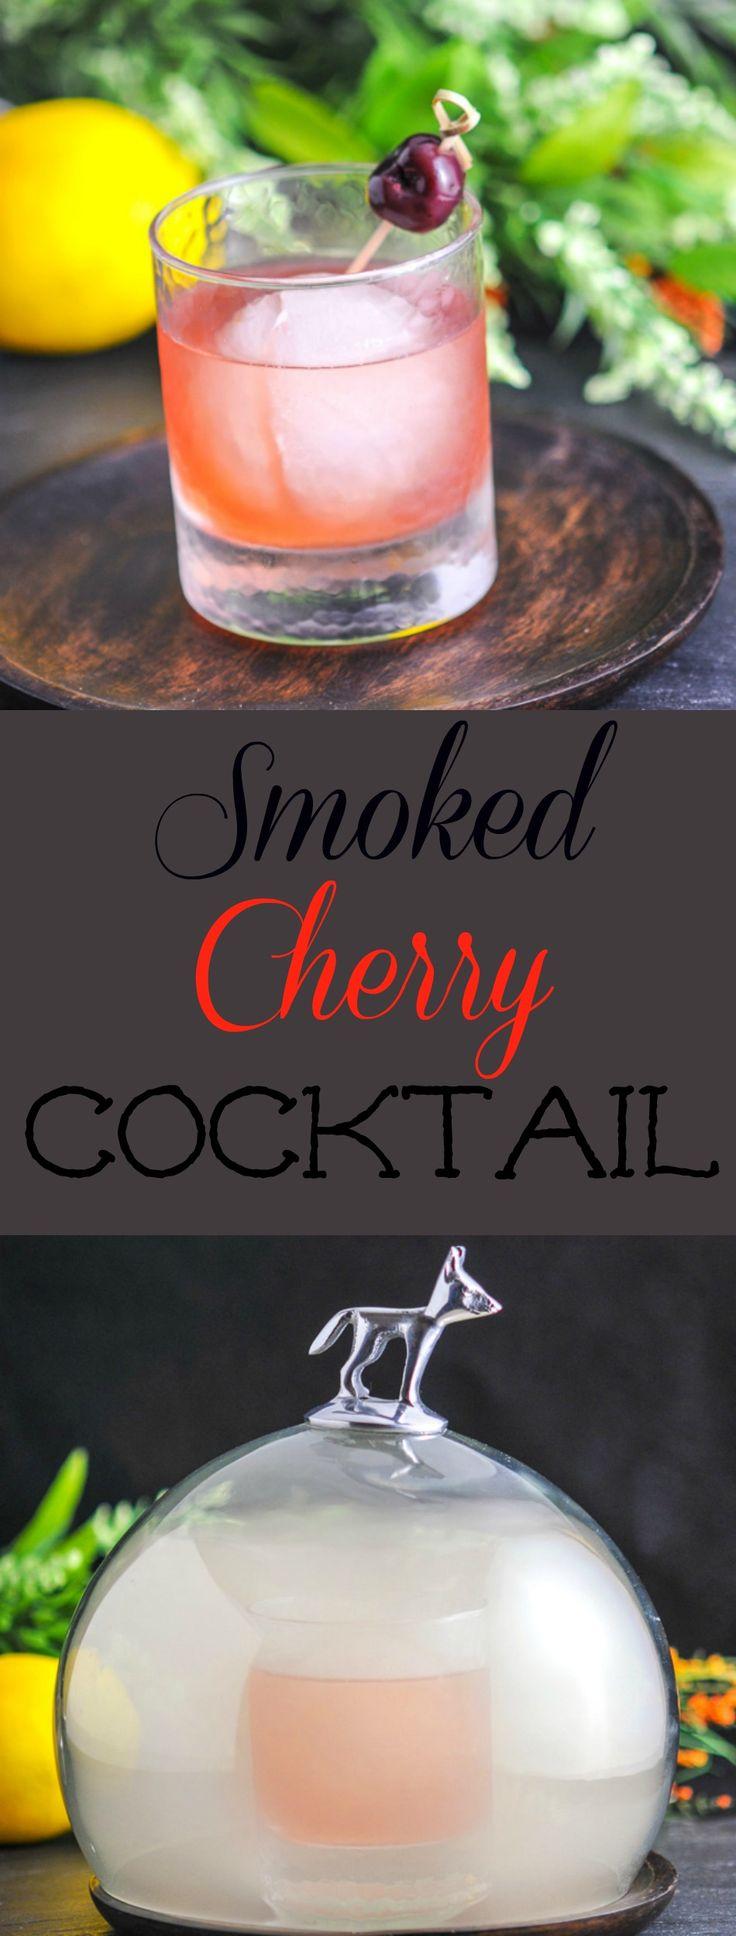 Smoked Cherry Cocktail - bourbon, honey brandy, white vermouth, sage simple syrup, lemon, campari, cherry bitters, cherry smoking wood  #cocktail #honey #whiskey #cherry